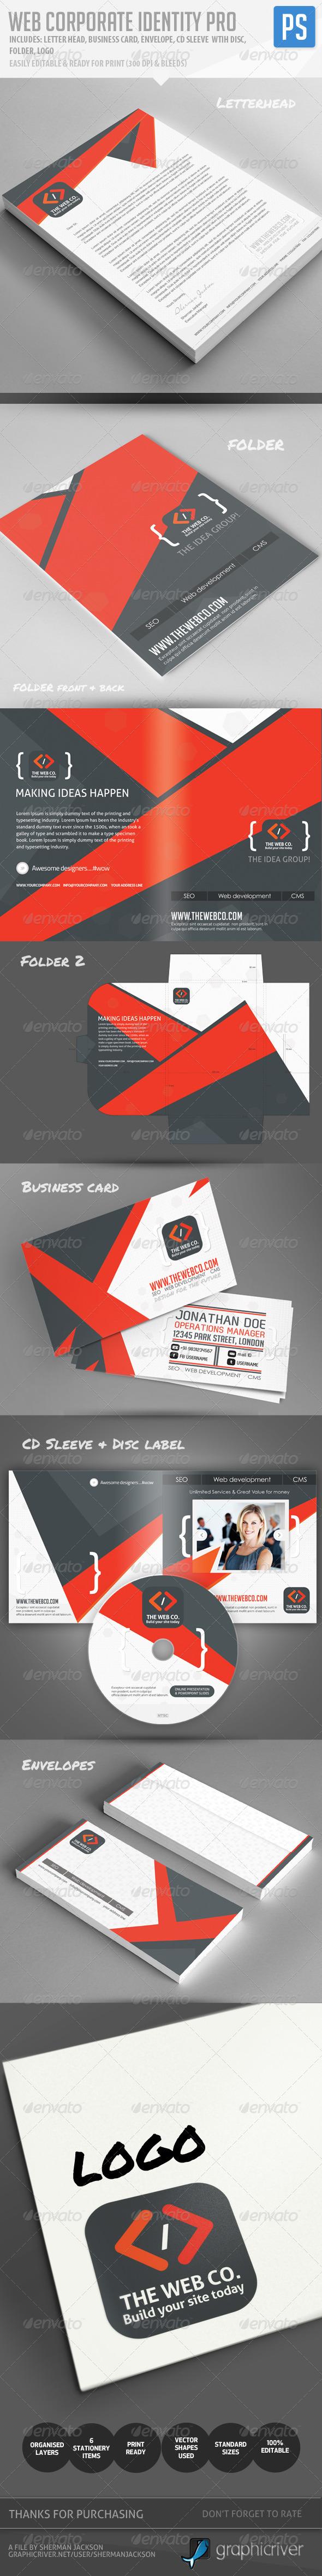 Web Corporate Identity Pro  - Stationery Print Templates